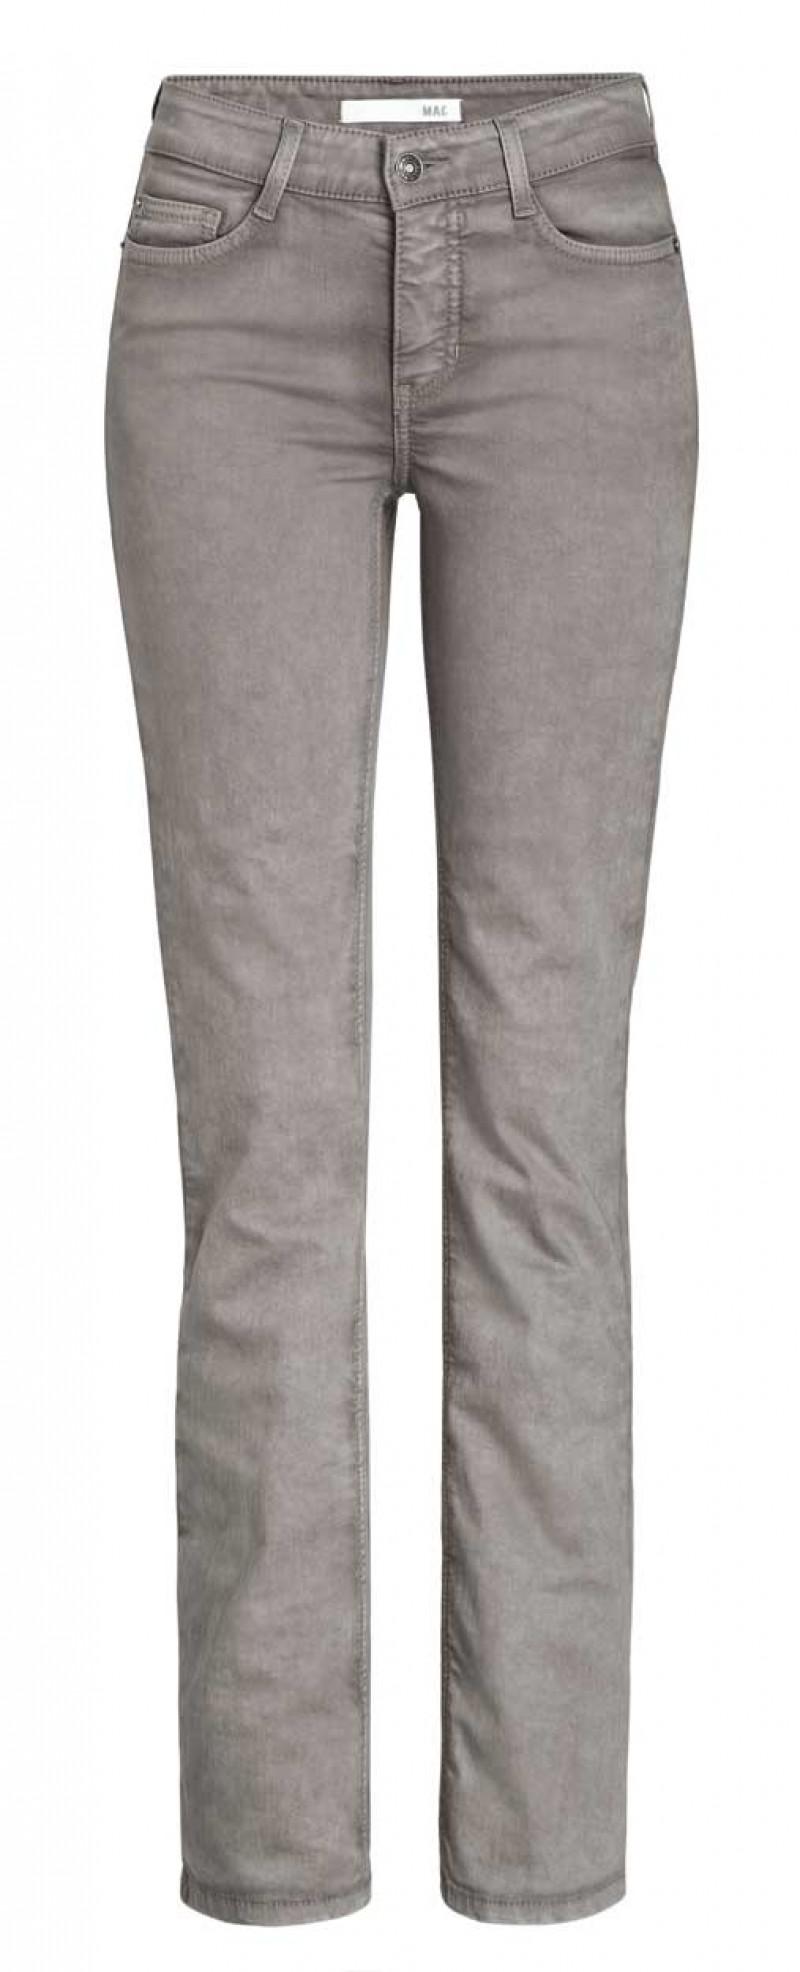 Mac Angela Jeans - Slim Fit - Light Summer Wash